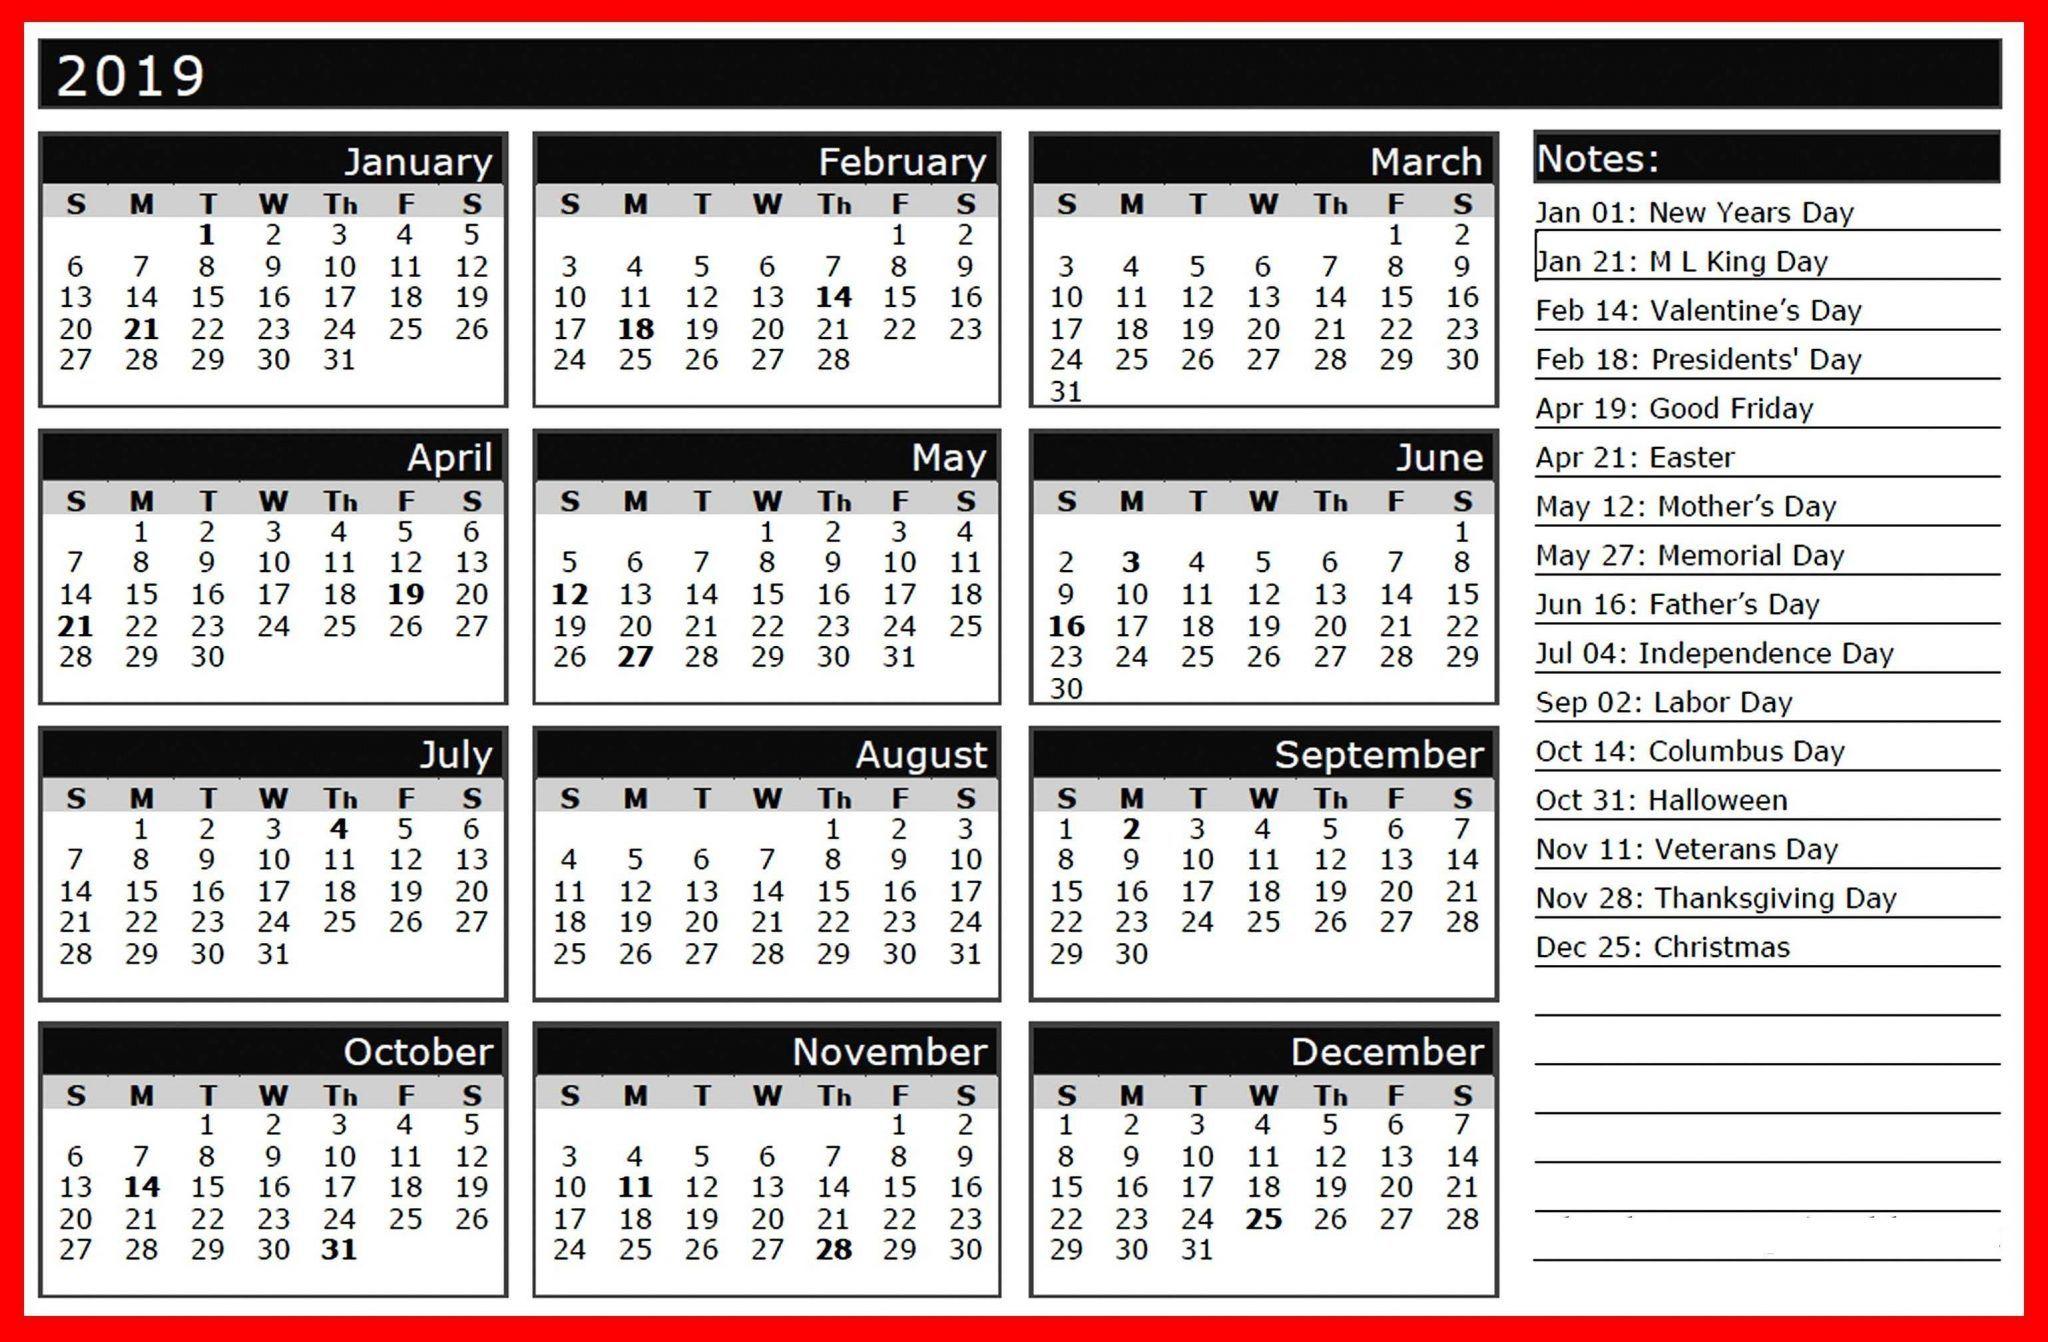 Free Yearly 2019 National Holiday Australia Calendar Templates